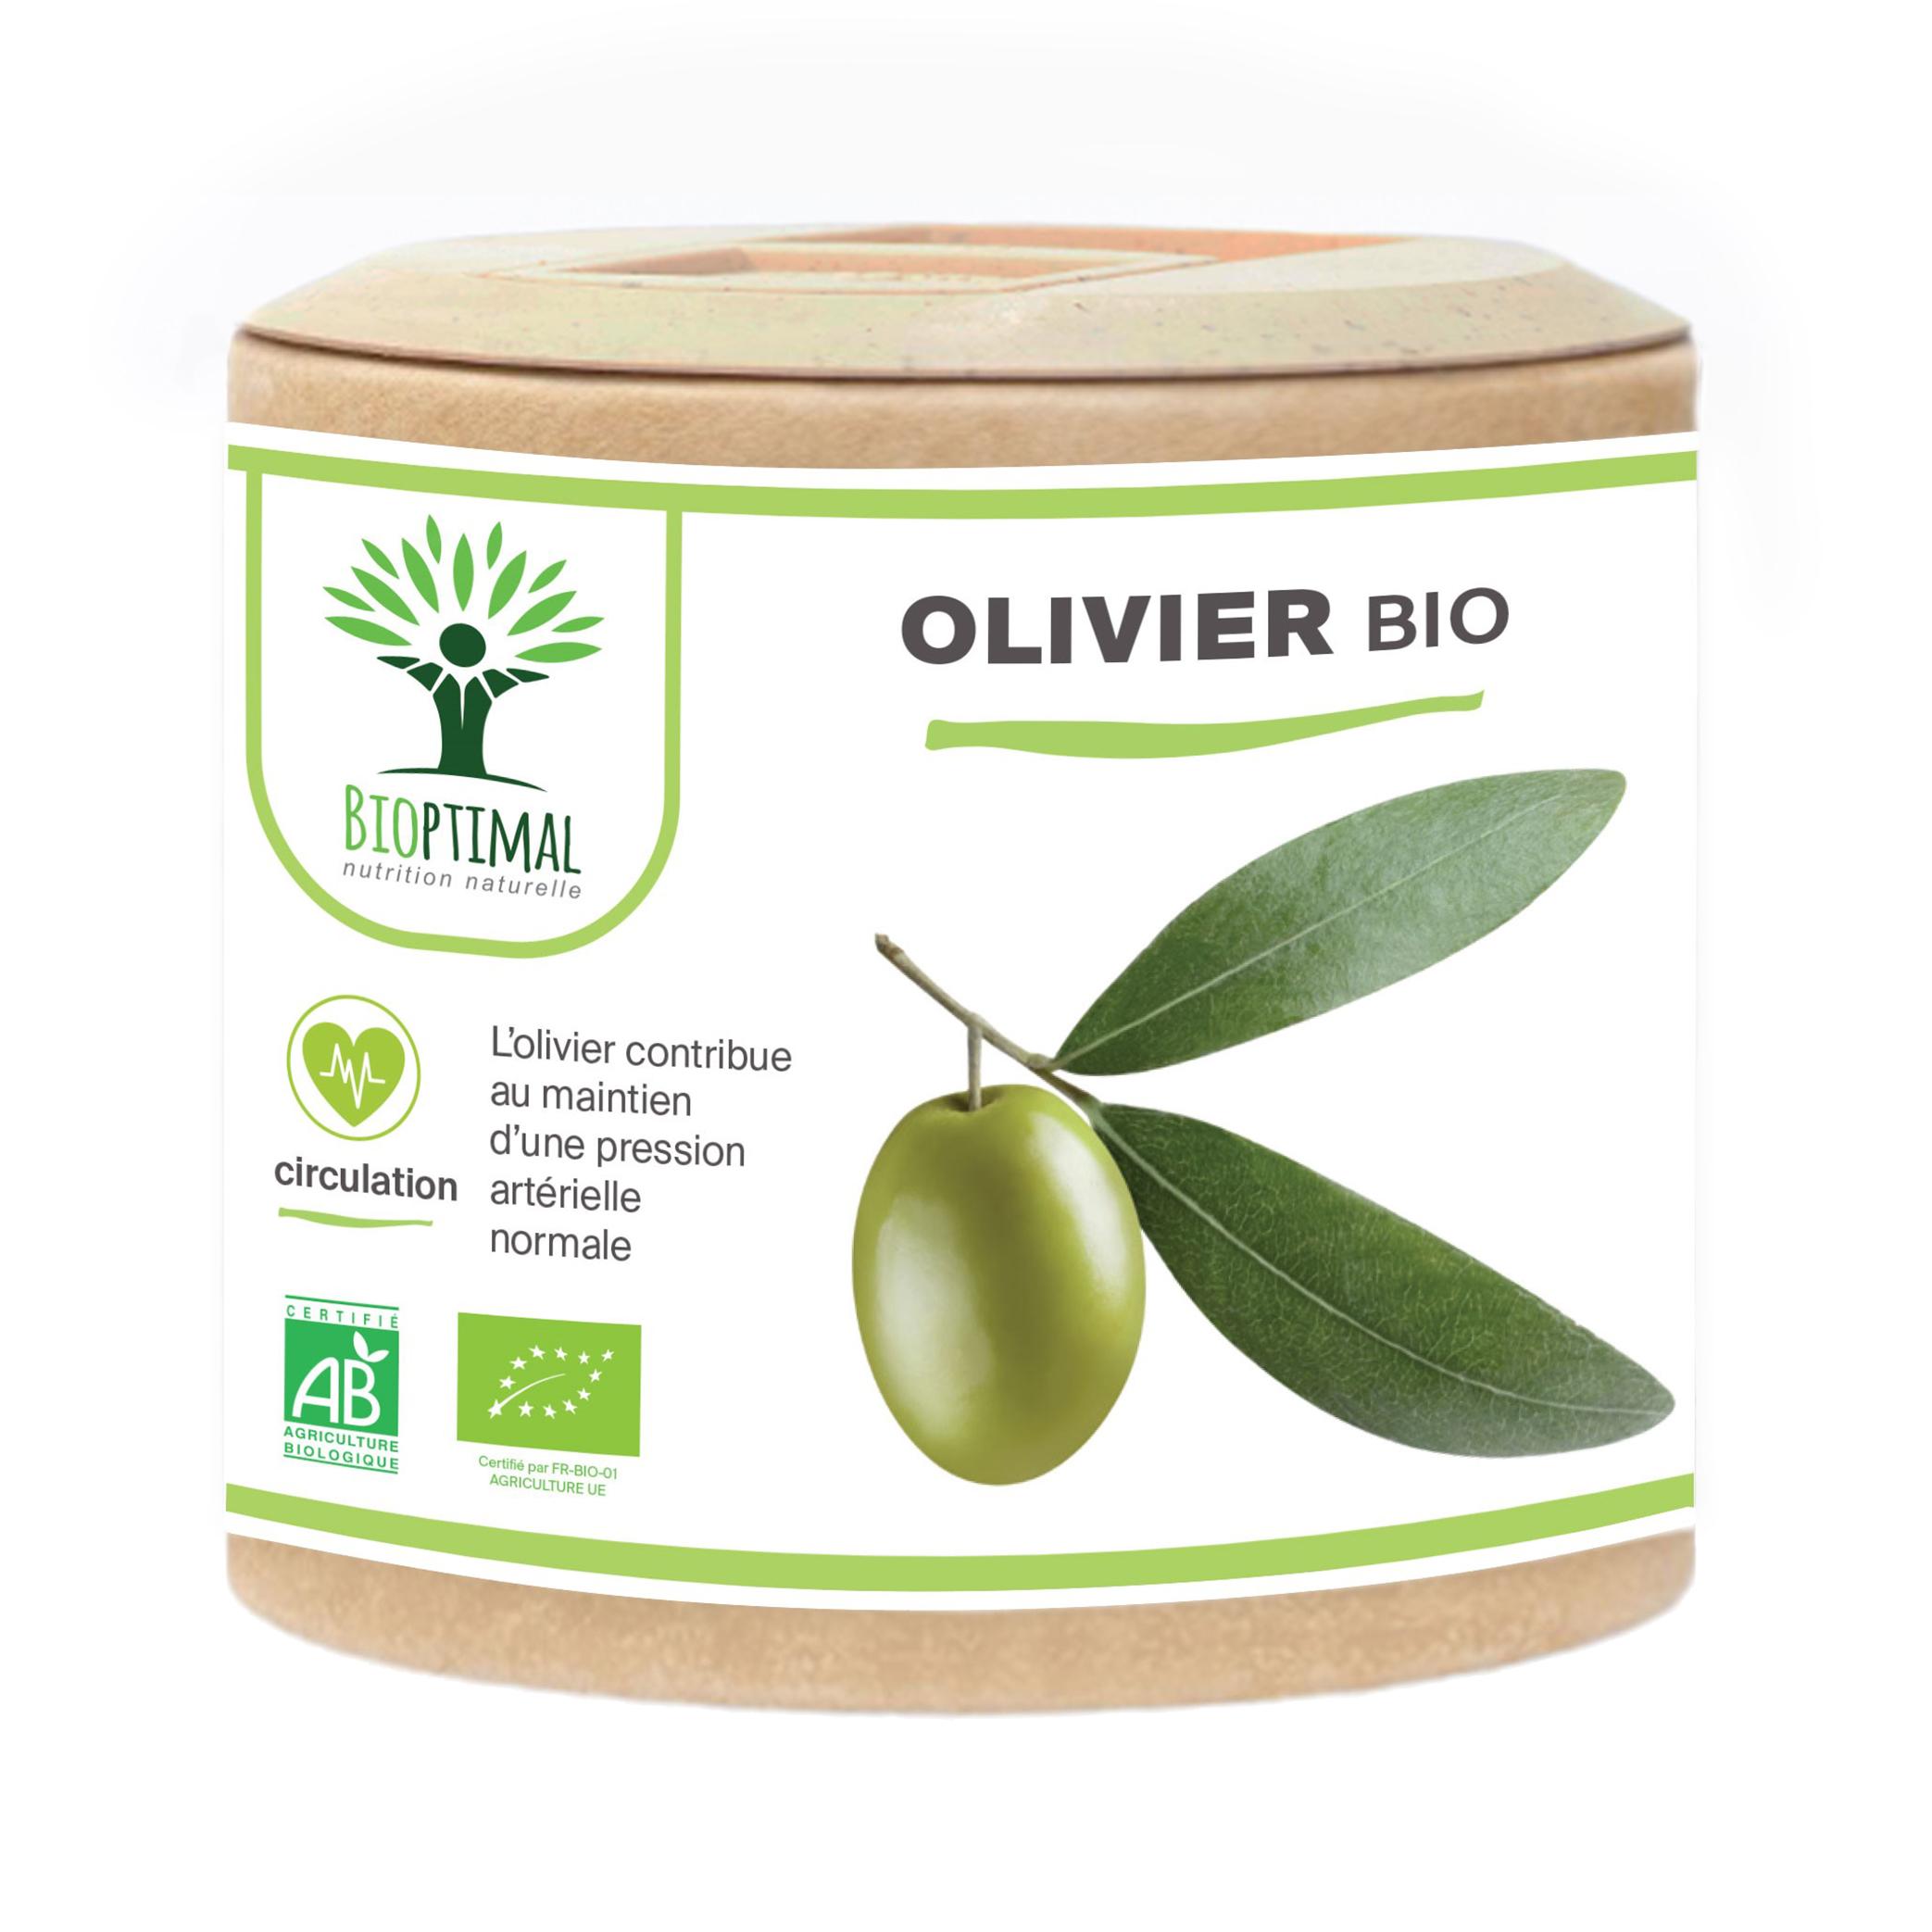 Bioptimal - Olivier bio - Circulation Sanguine Tension Cardio - 60 gélules